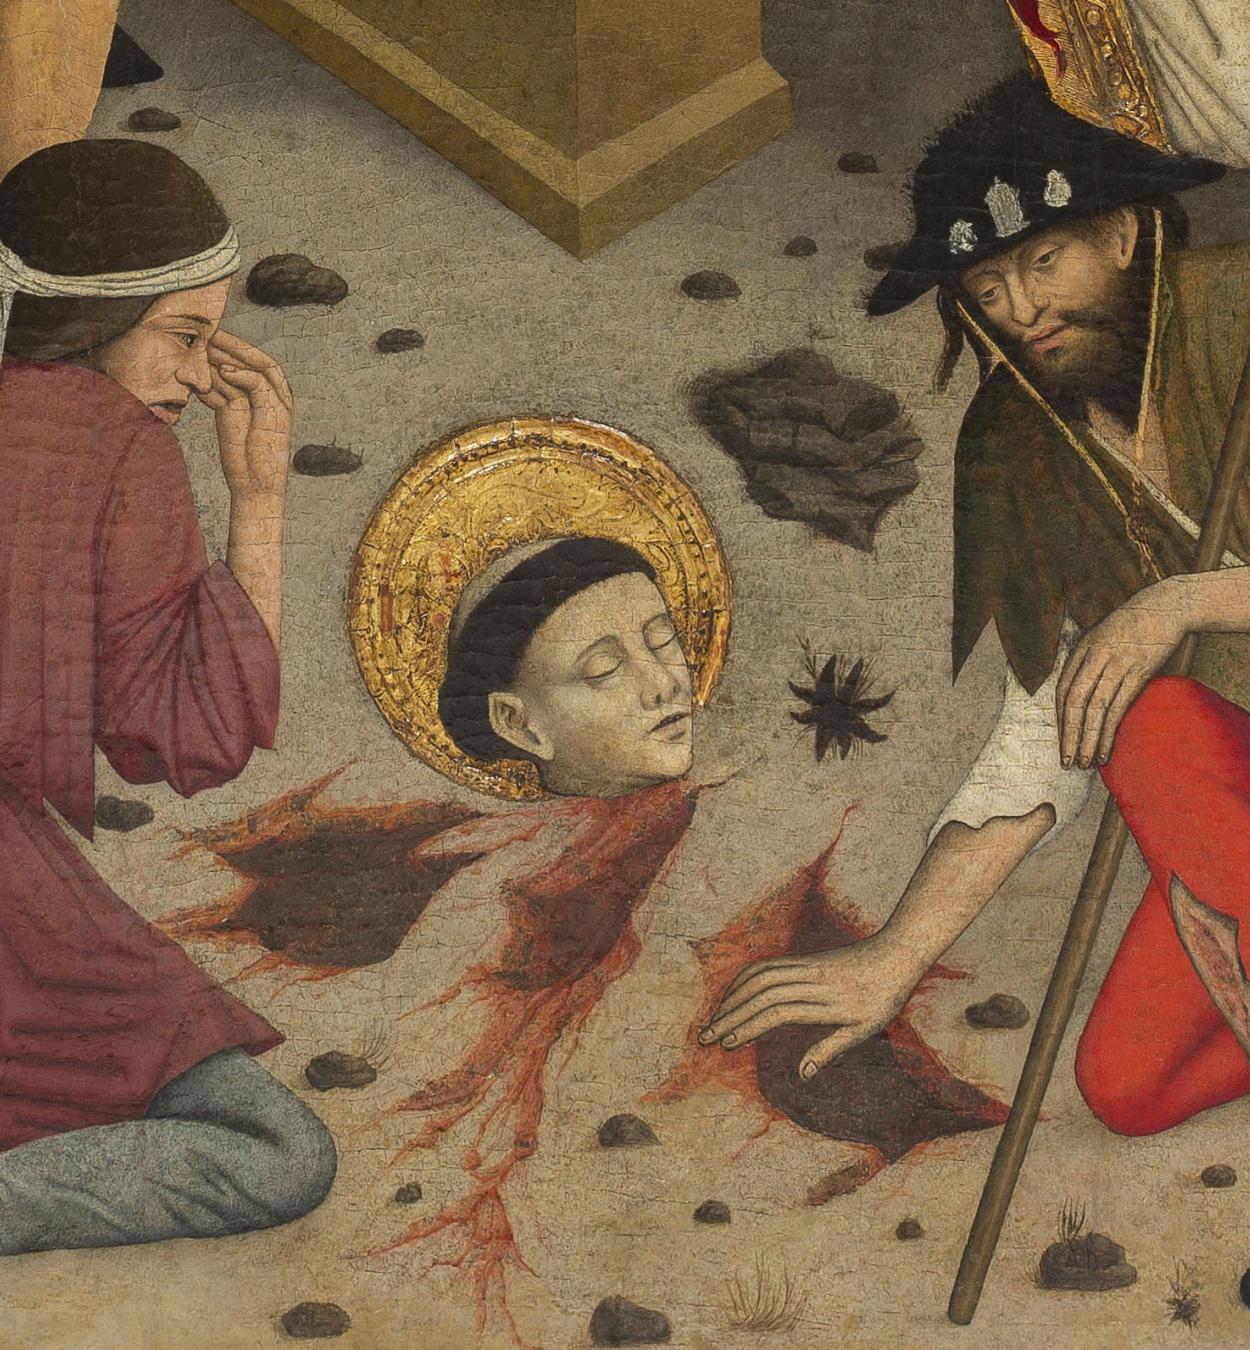 Lluís Dalmau - The Beheading of Saint Baudilus - circa 1448 [2]